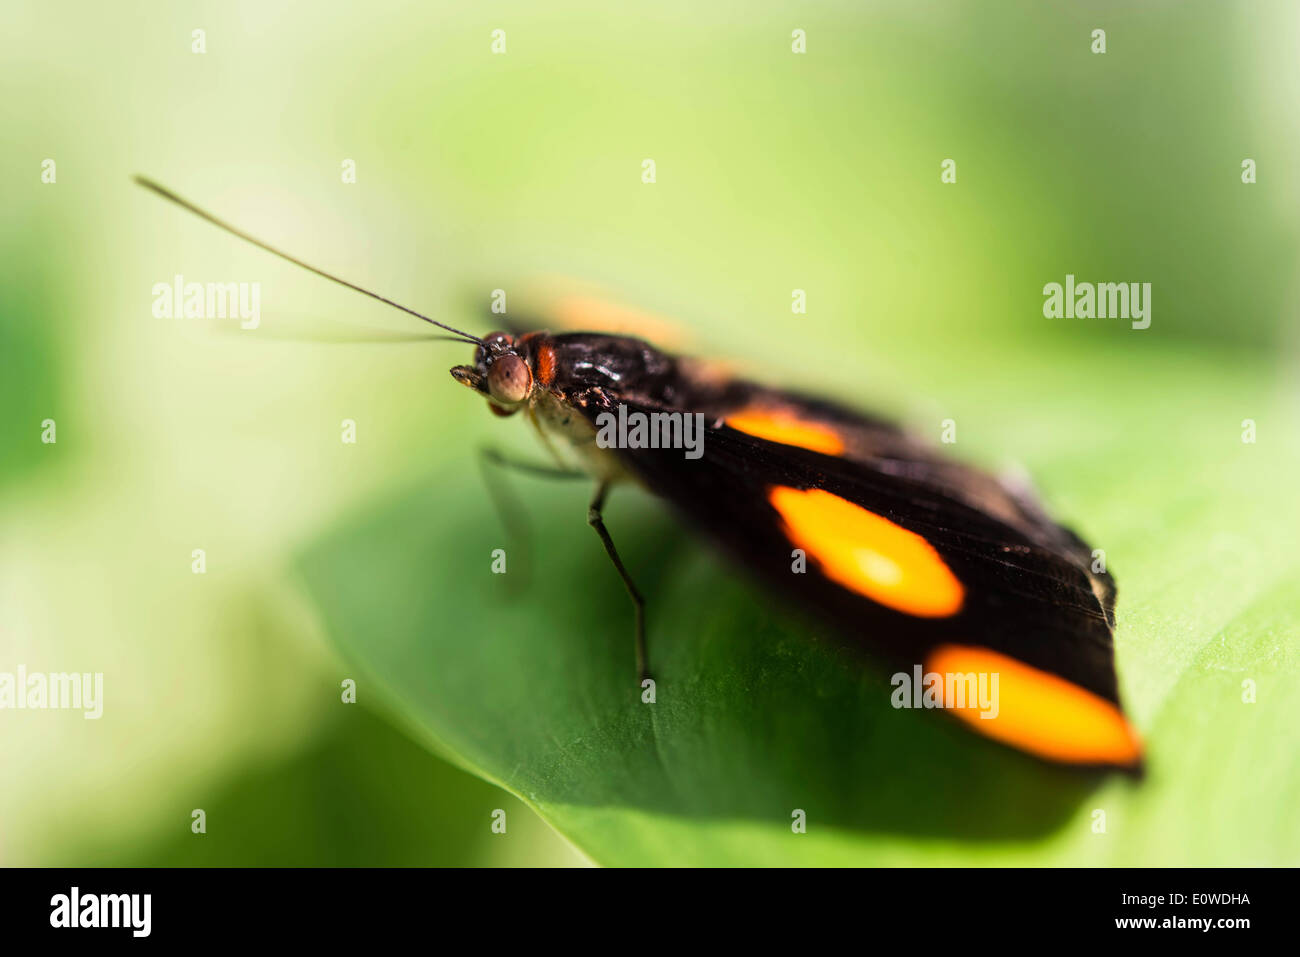 Banner mate azul, azul-frosted Catone o Grecian Shoemaker (Catonephele numilia), Butterfly encaramado sobre una hoja verde, cautiva Imagen De Stock